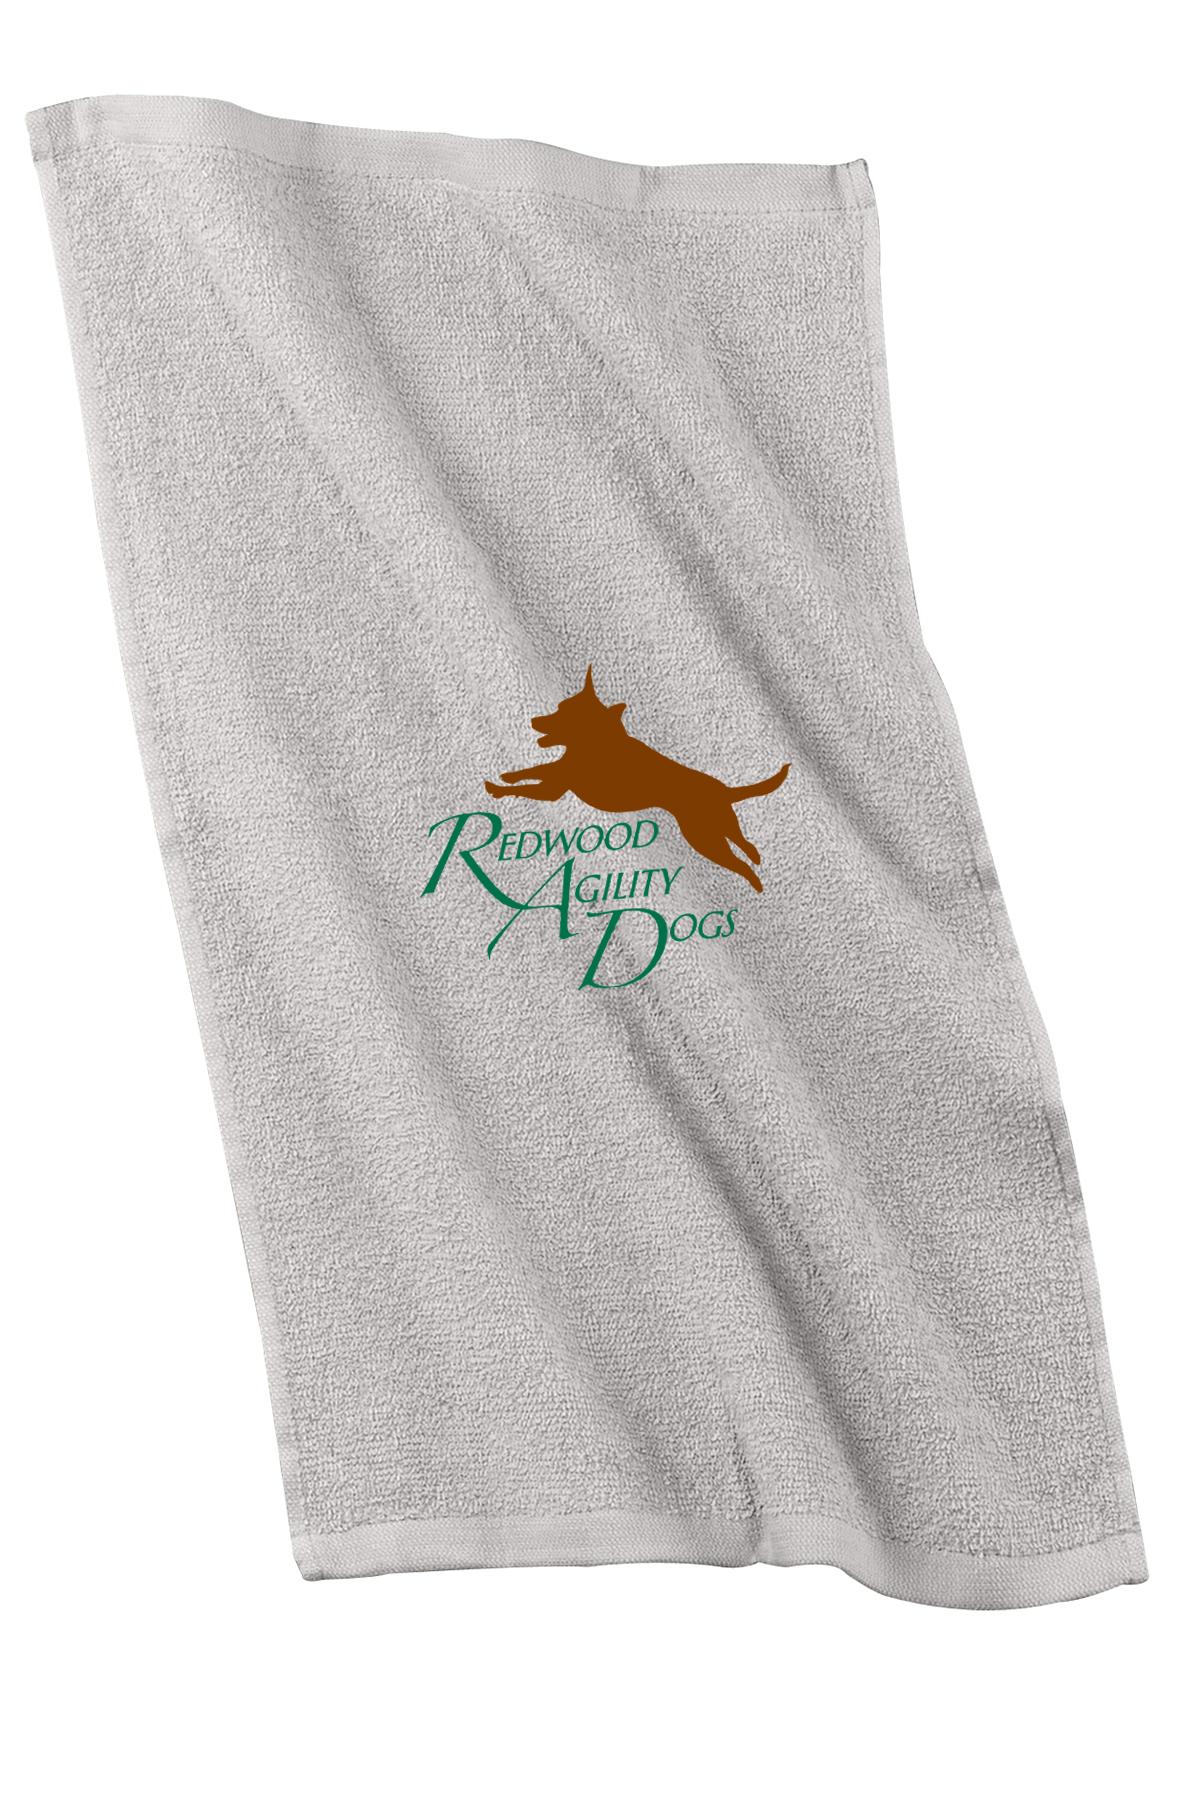 custom design of Port & Company® PT38 Rally Towel